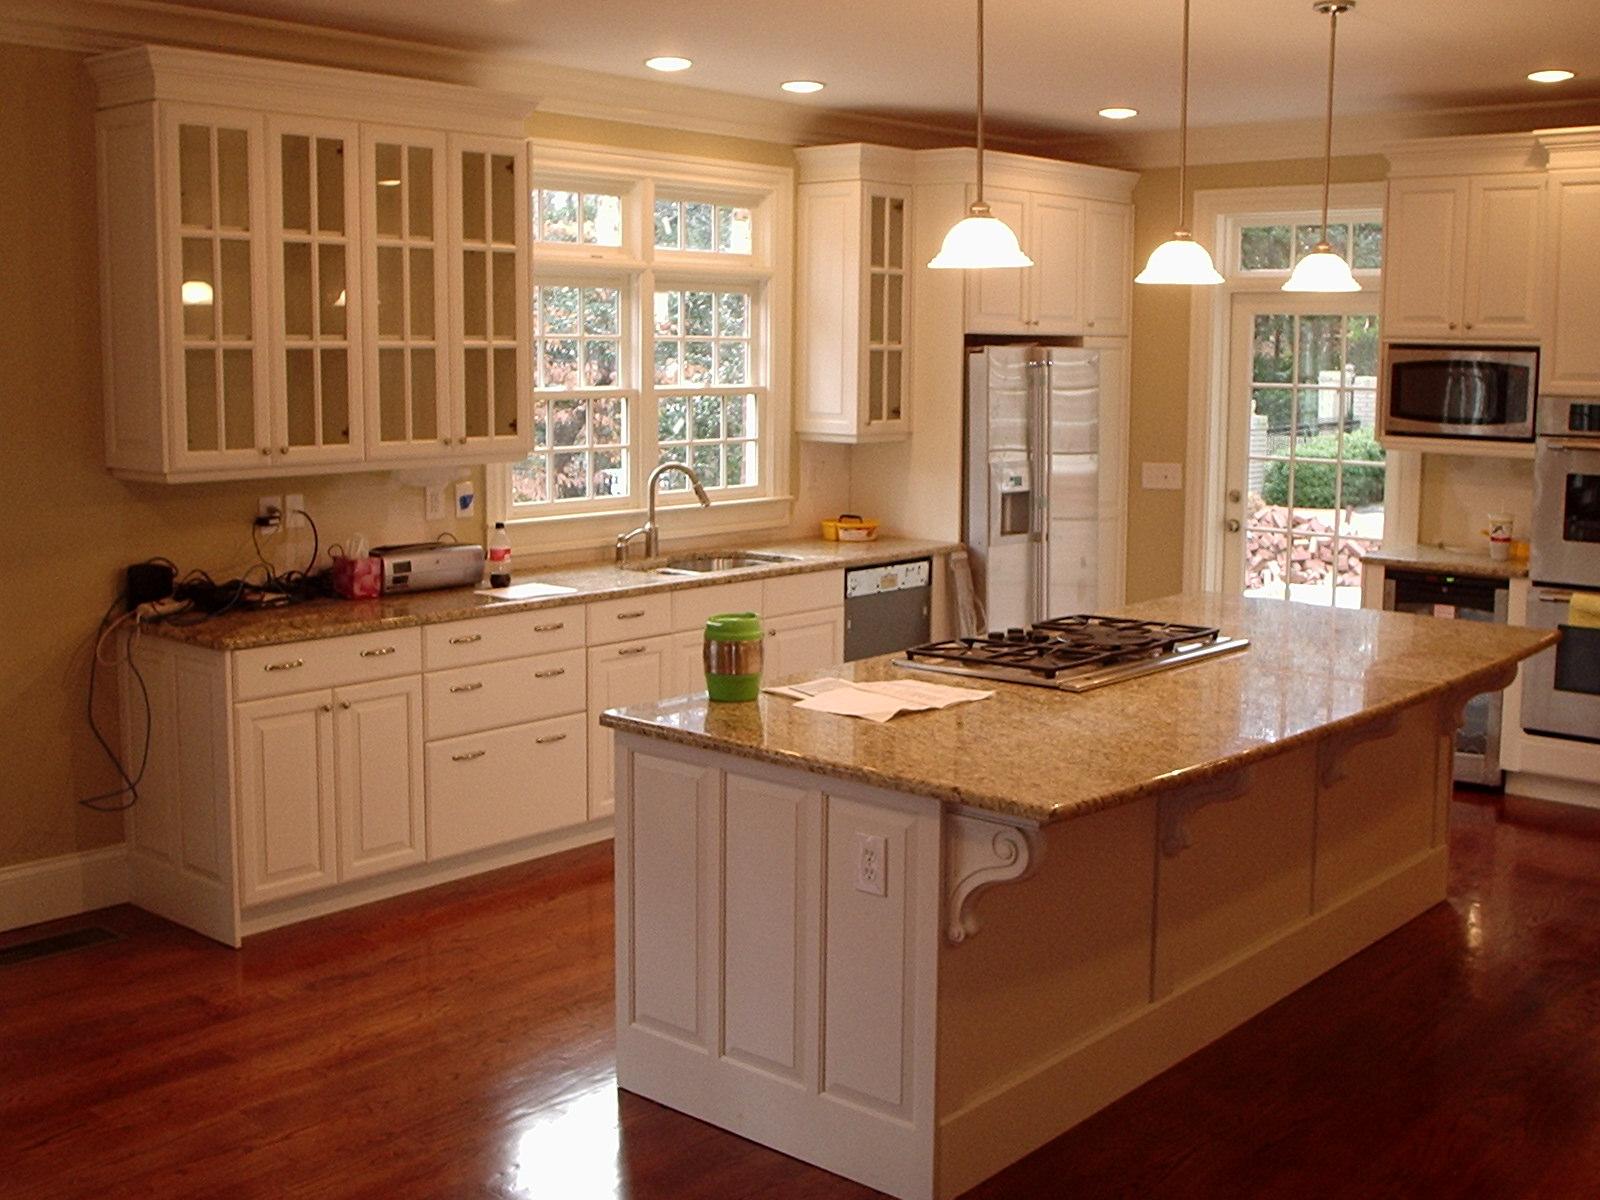 Kitchen cabinets shelves Photo - 2